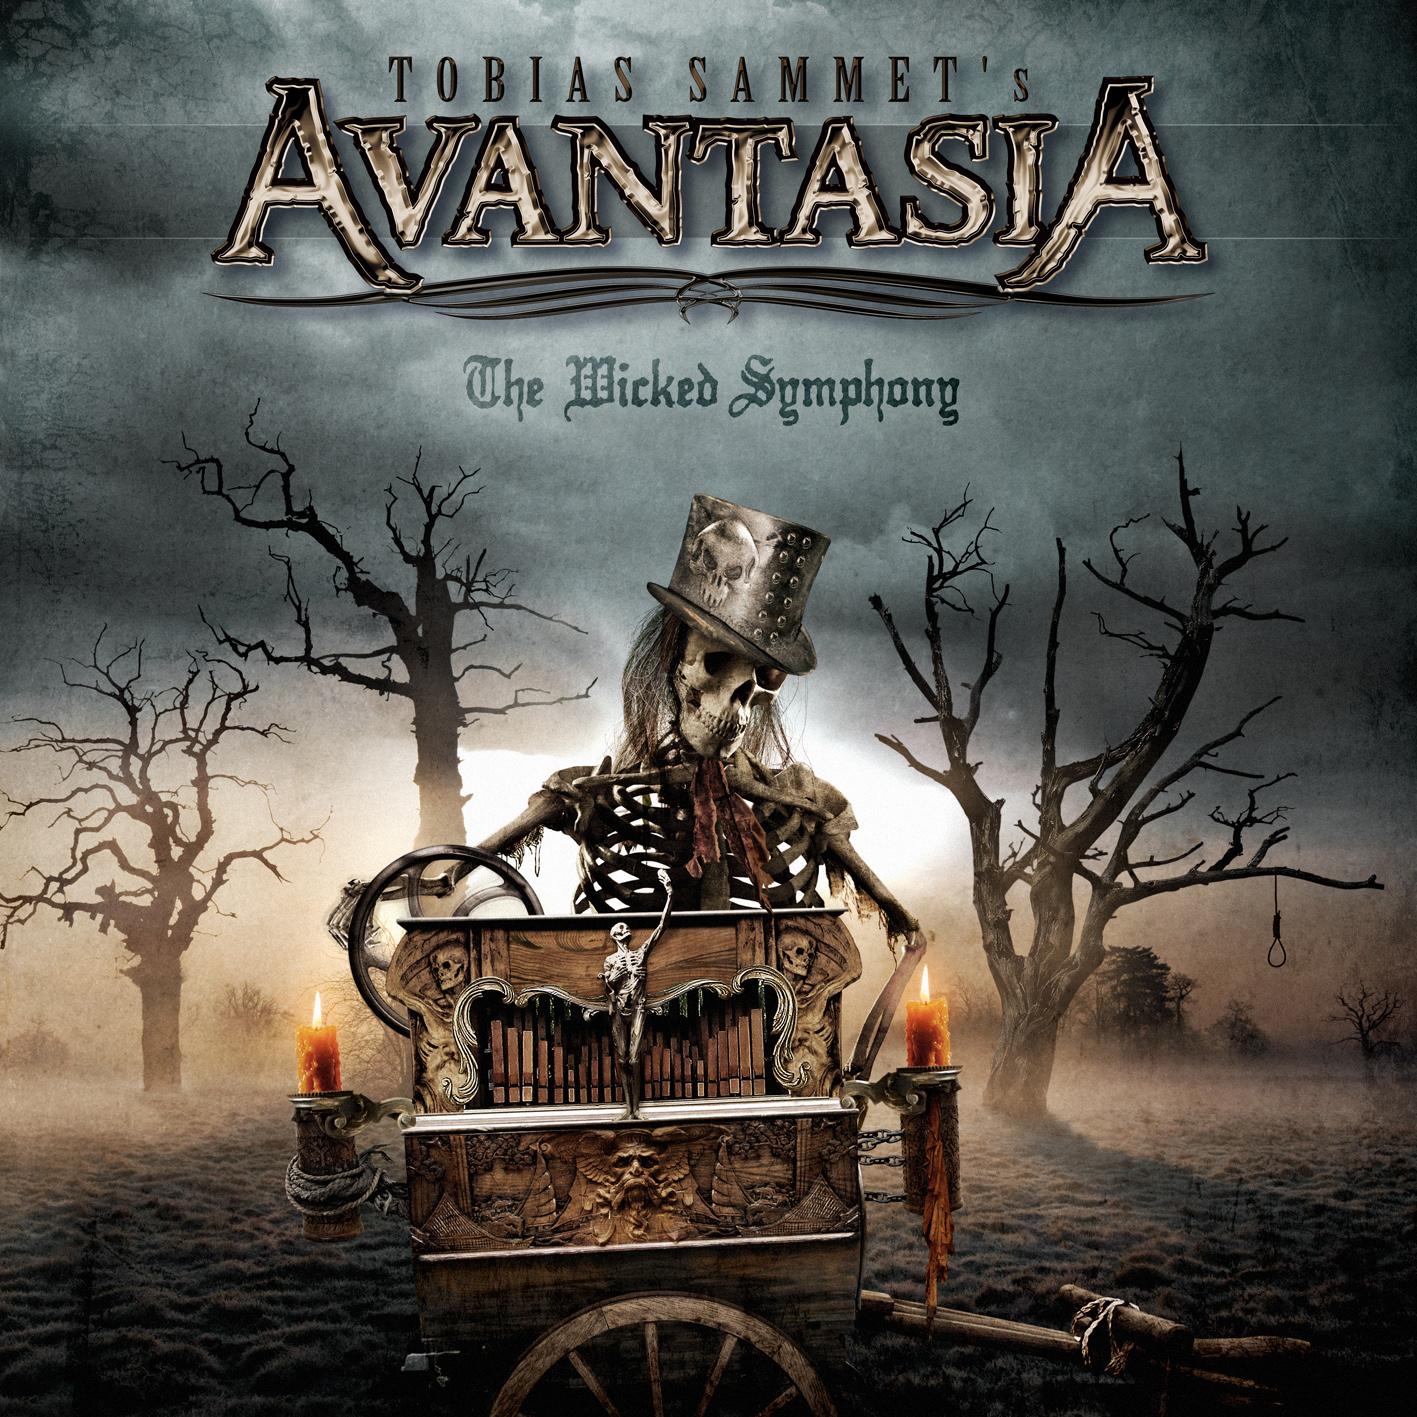 Avantasia – The Wicked Symphony Review